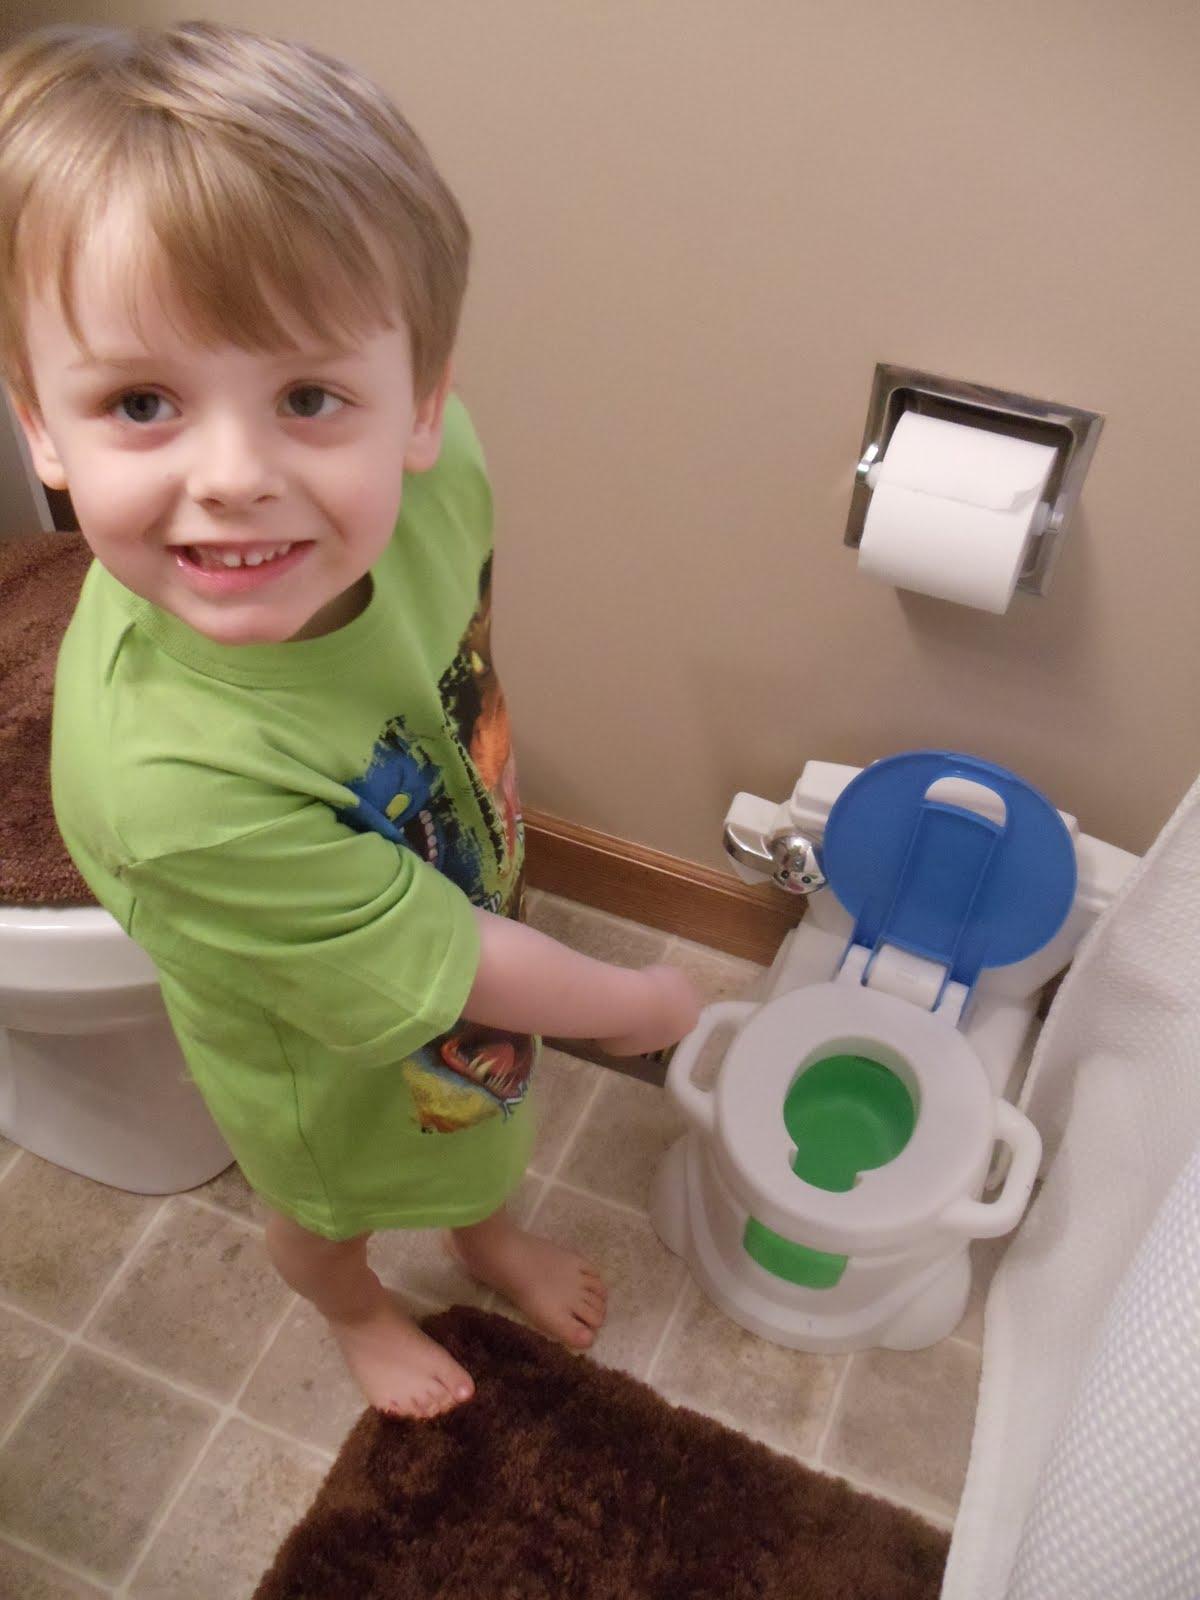 Jpg4 Netboys: Little Boy Show Pee Pee